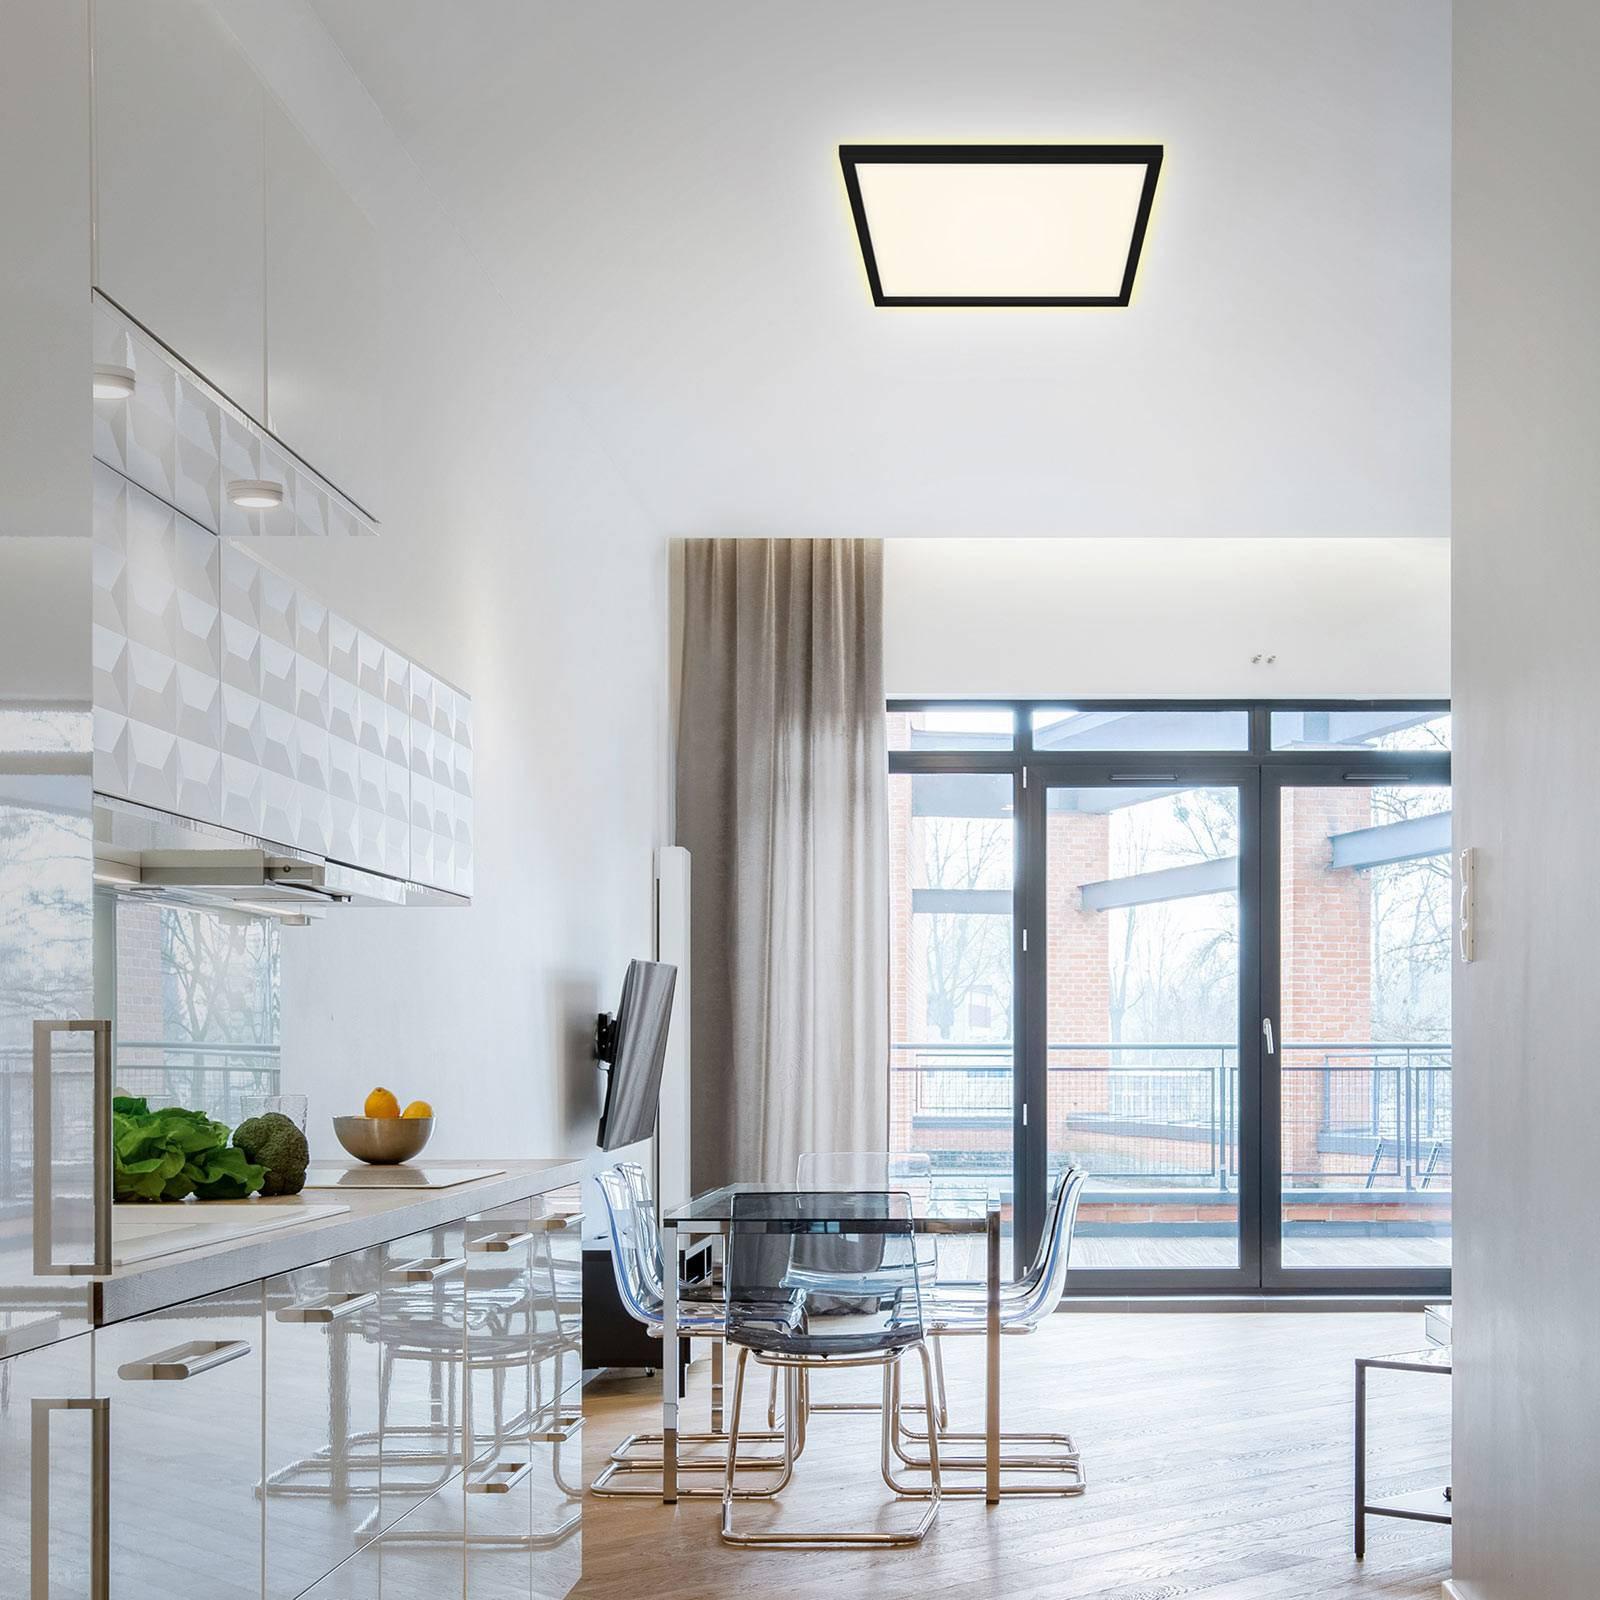 LED-taklampe 7364 42 x 42 cm, svart